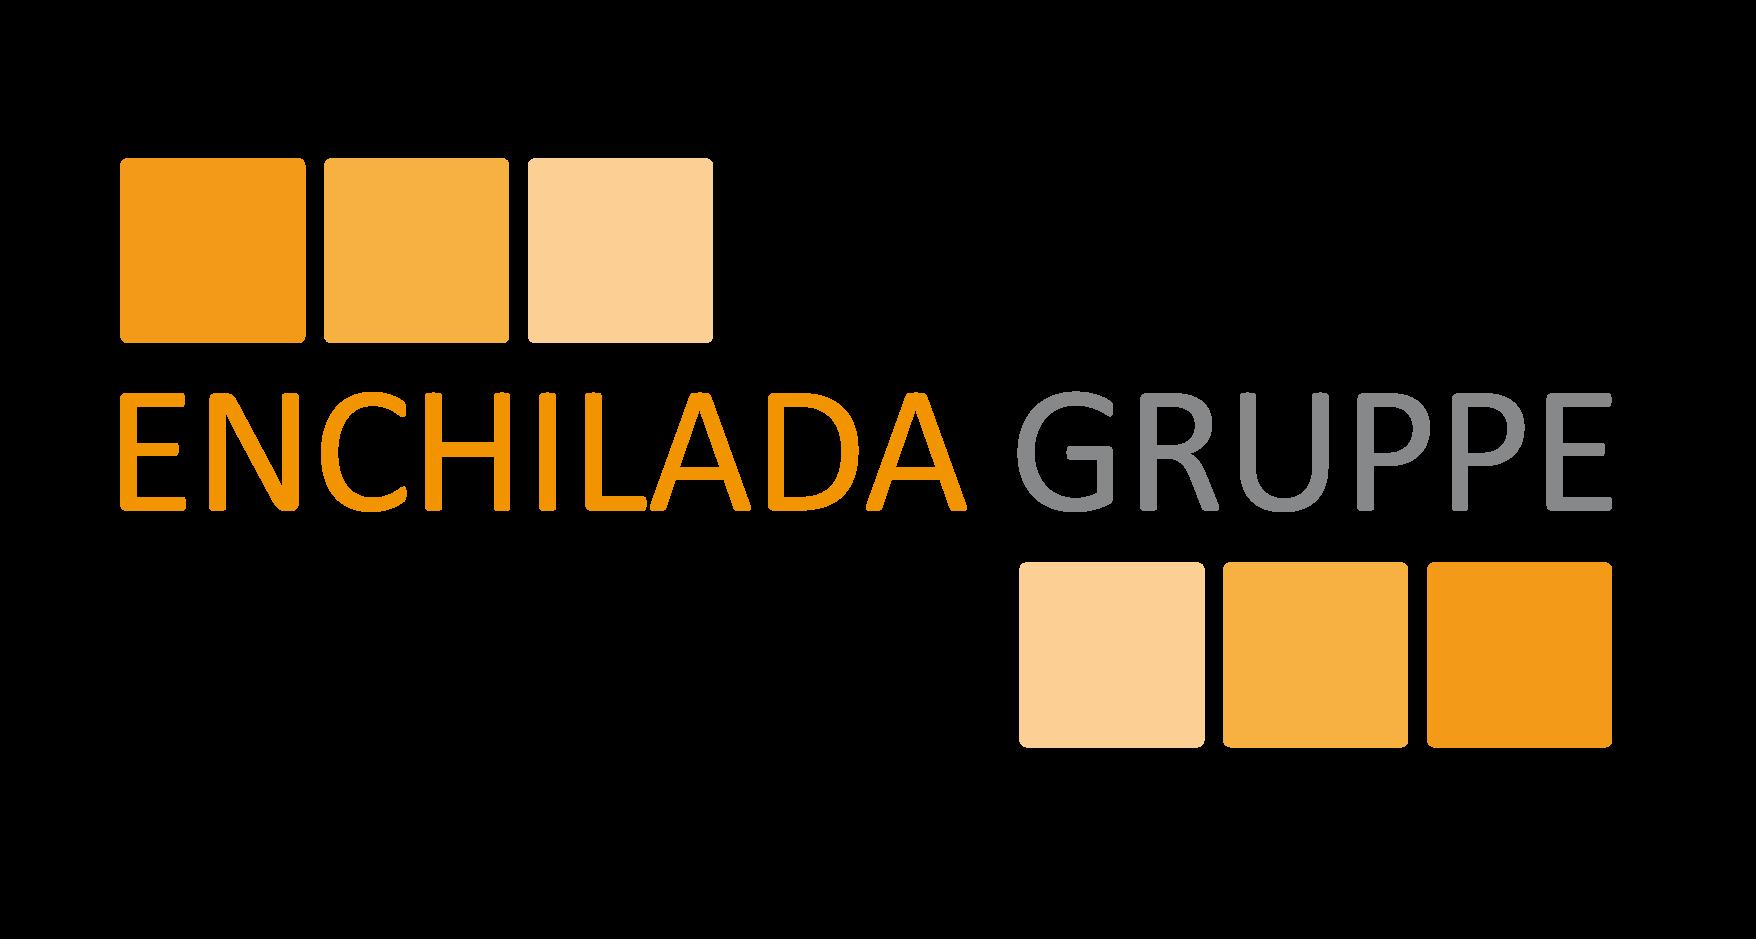 EnchiladaGruppe